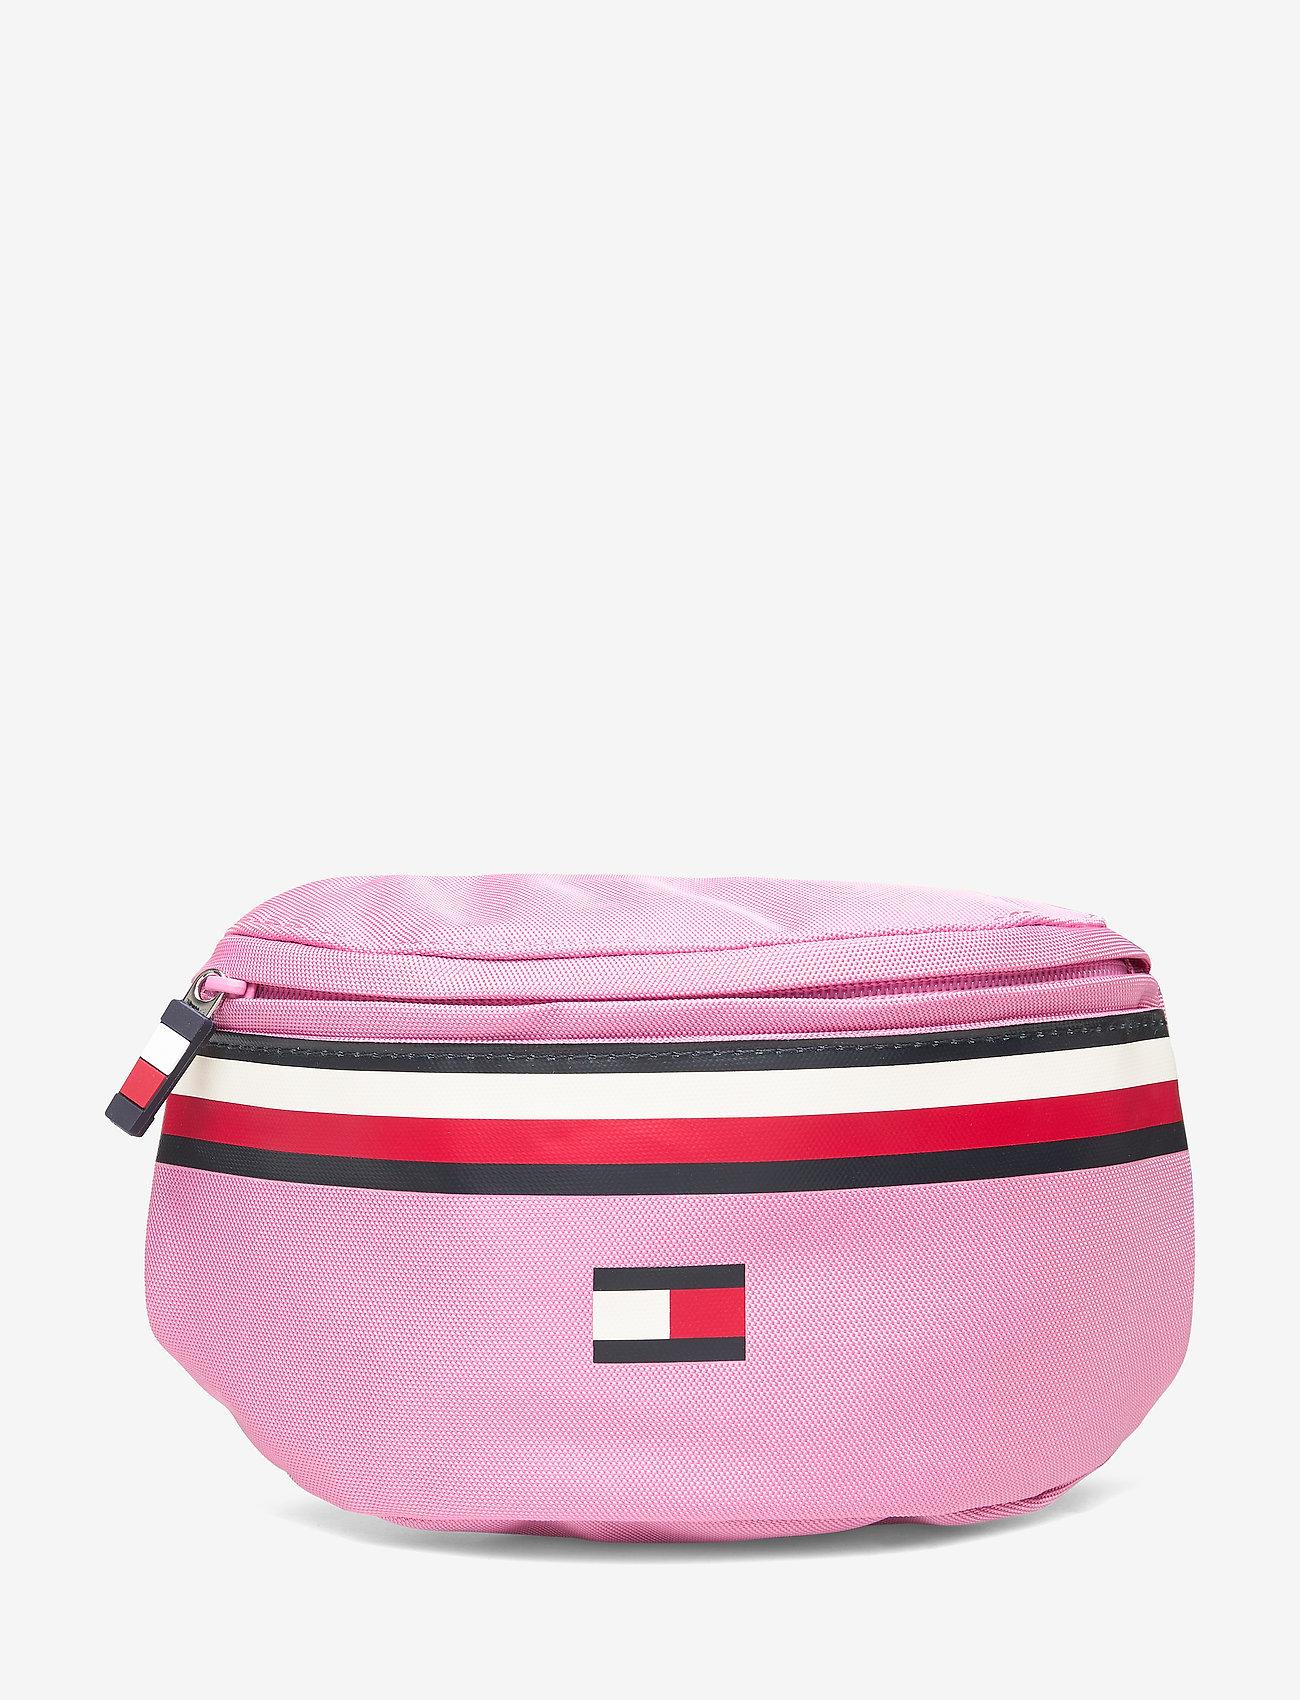 Tommy Hilfiger - SMU KIDS FLAG BUMBAG - totes & small bags - cashmere rose - 0